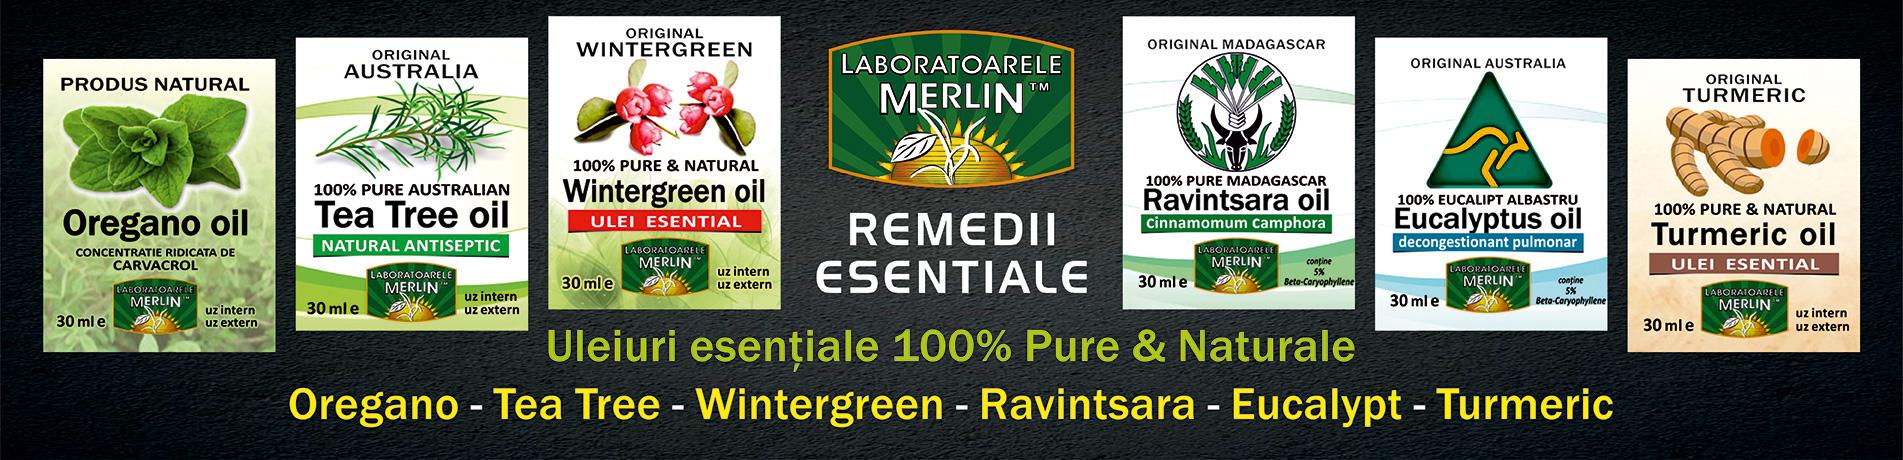 baner-uleiuri-esentiale-remedii-pure-naturale-Laboratoarele-Merlin